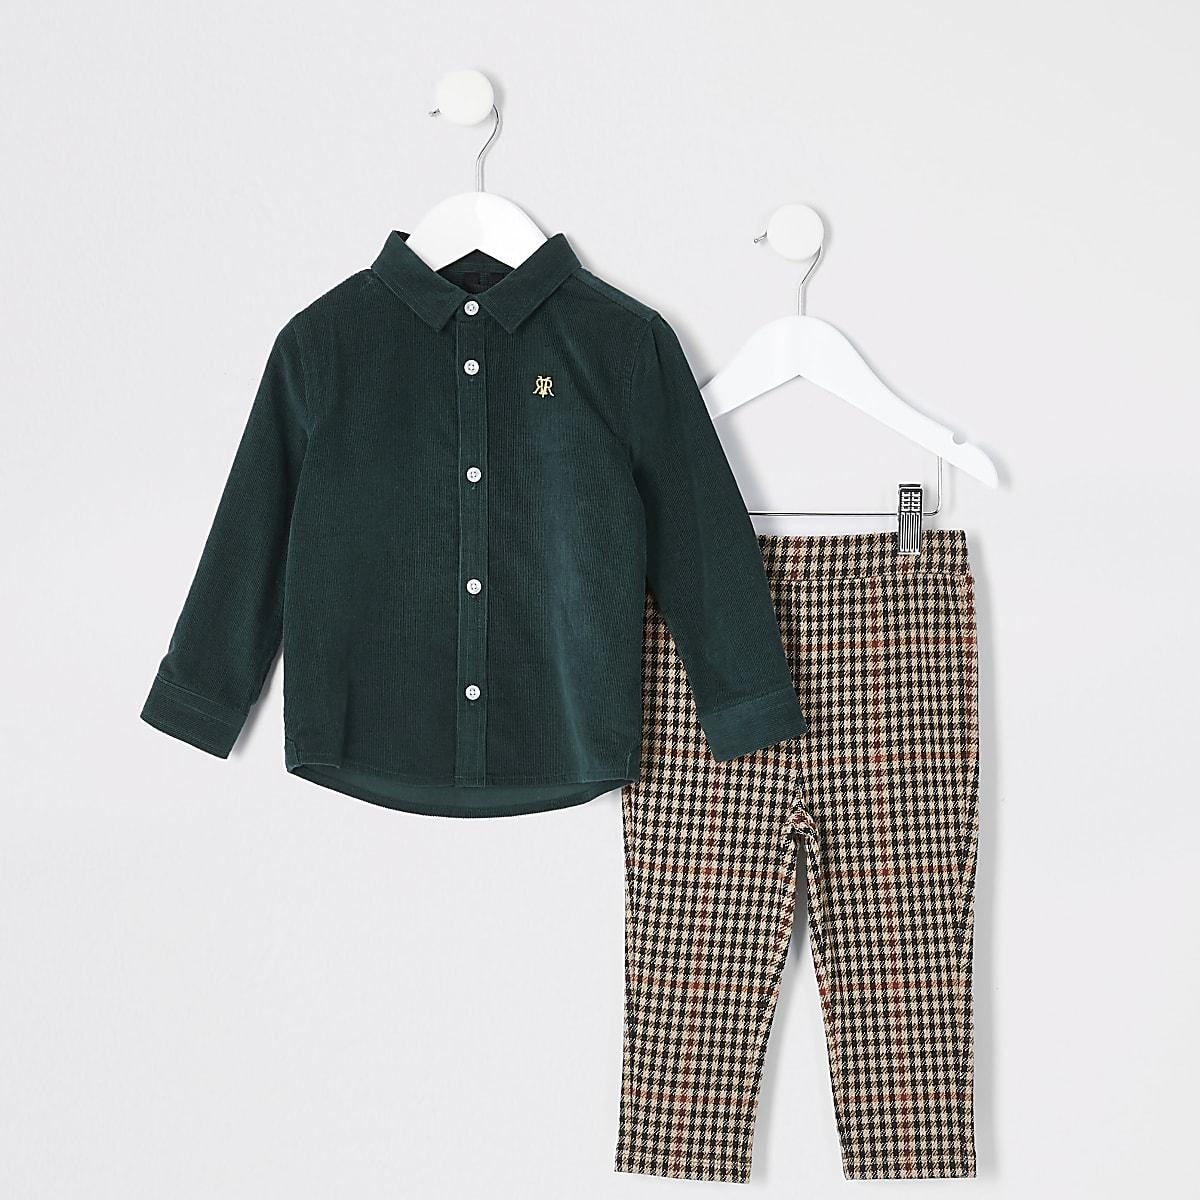 Mini boys dark green cord shirt outfit